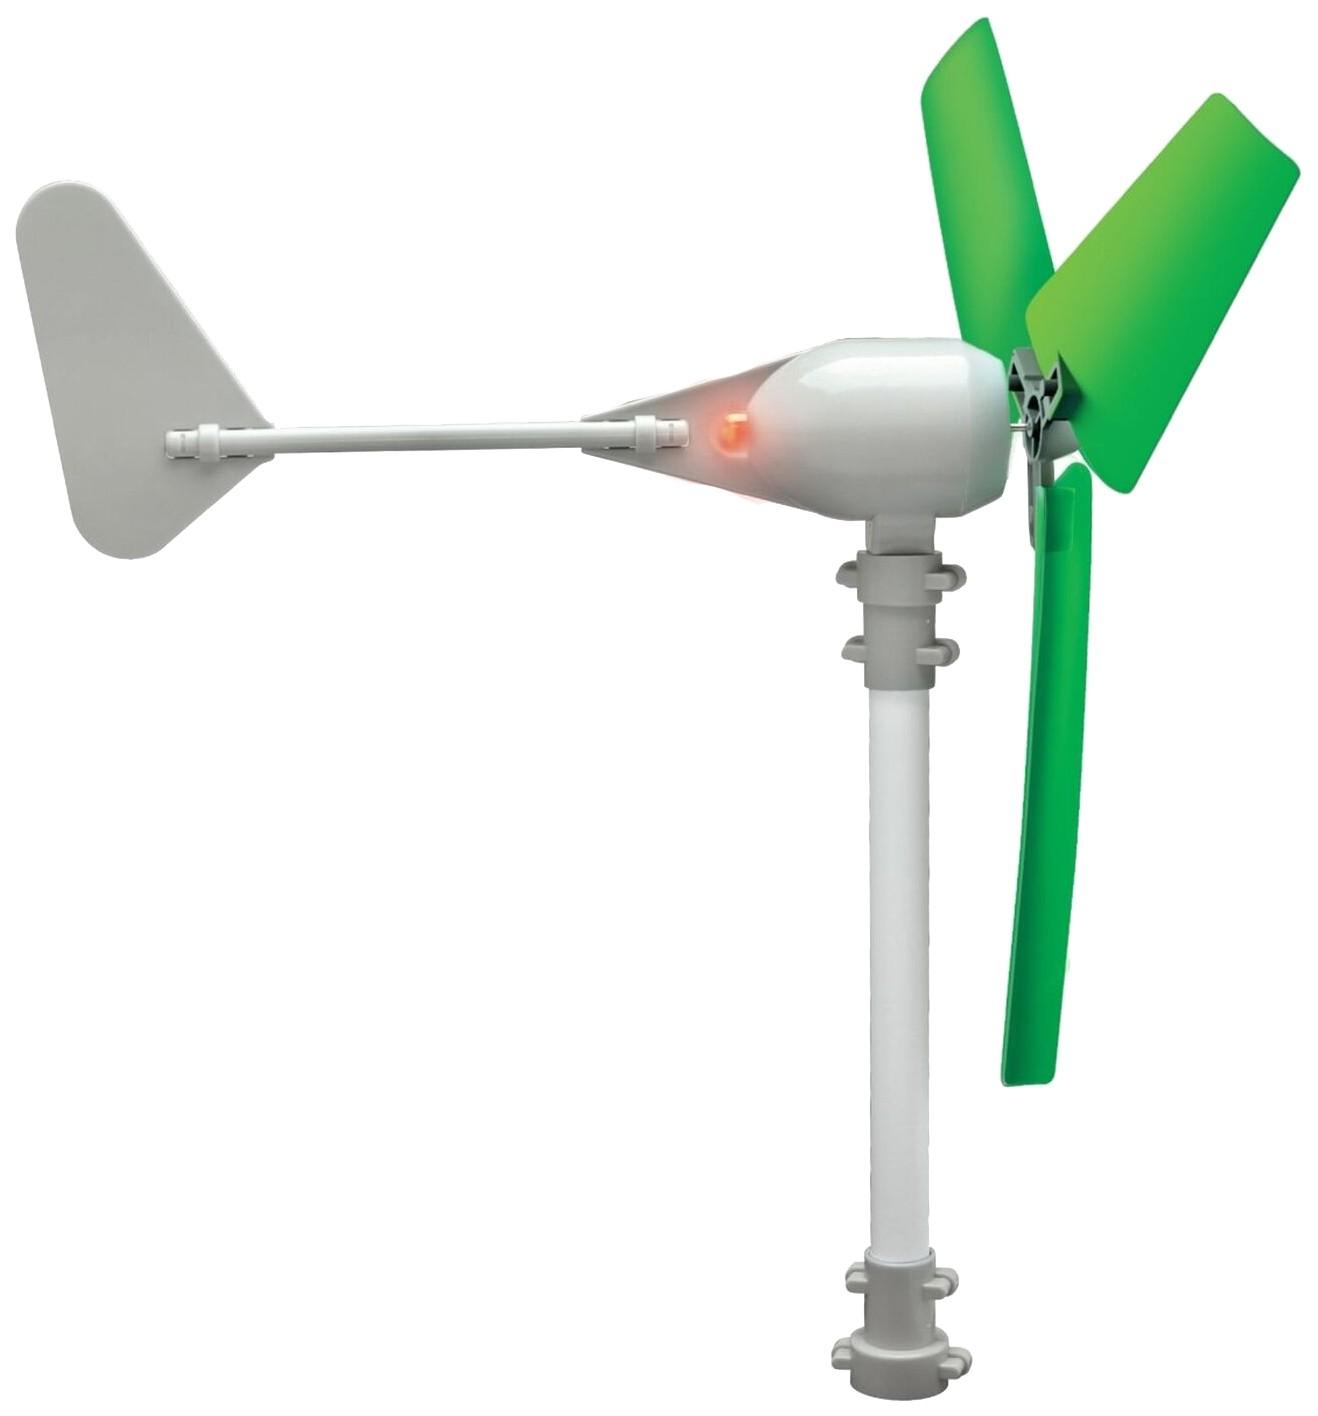 Набор 4M 00-03378 Ветряная турбина фото